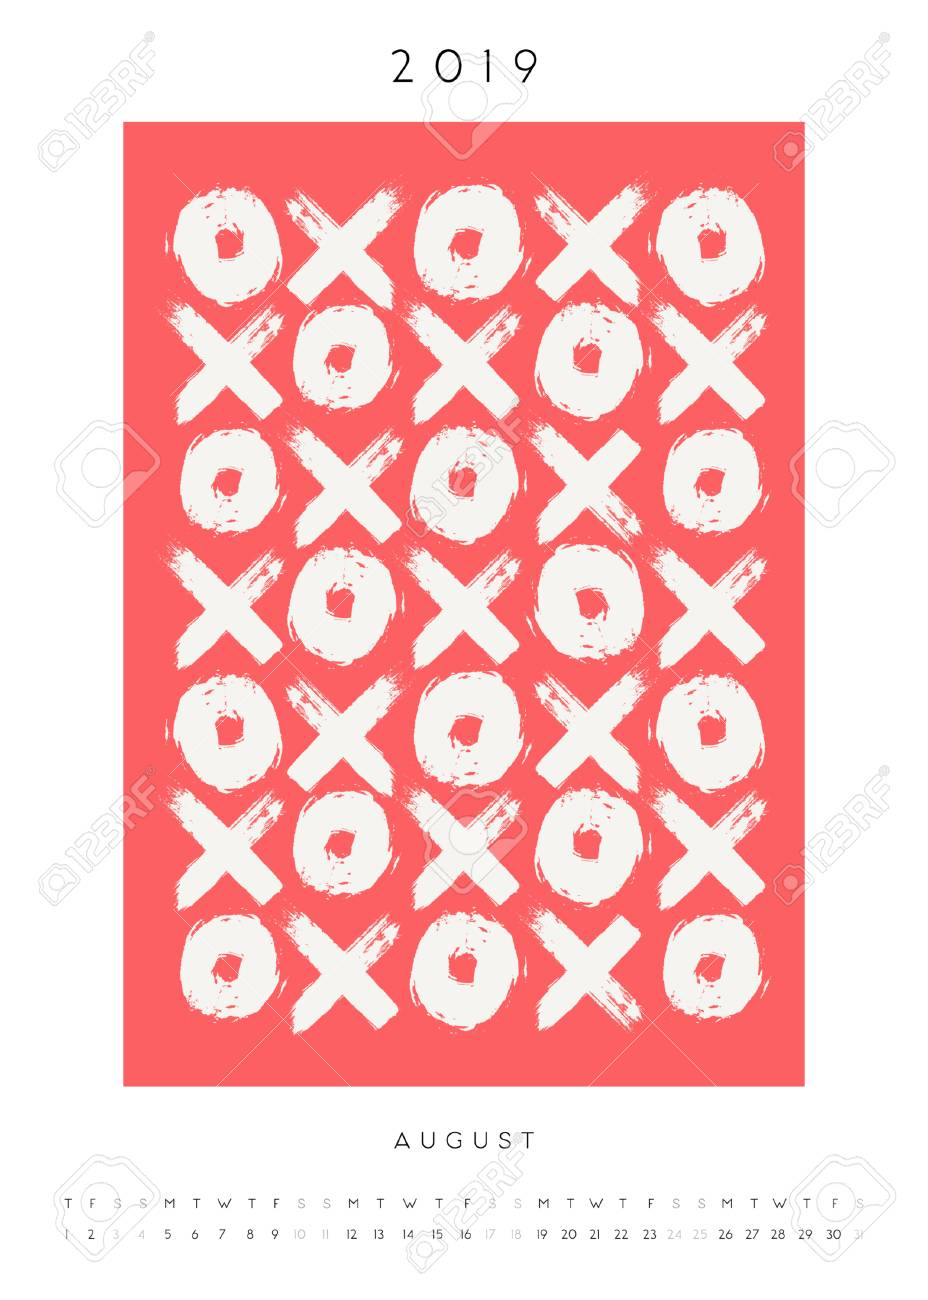 Printable A4 size August 2019 calendar template  Hand drawn symbols,